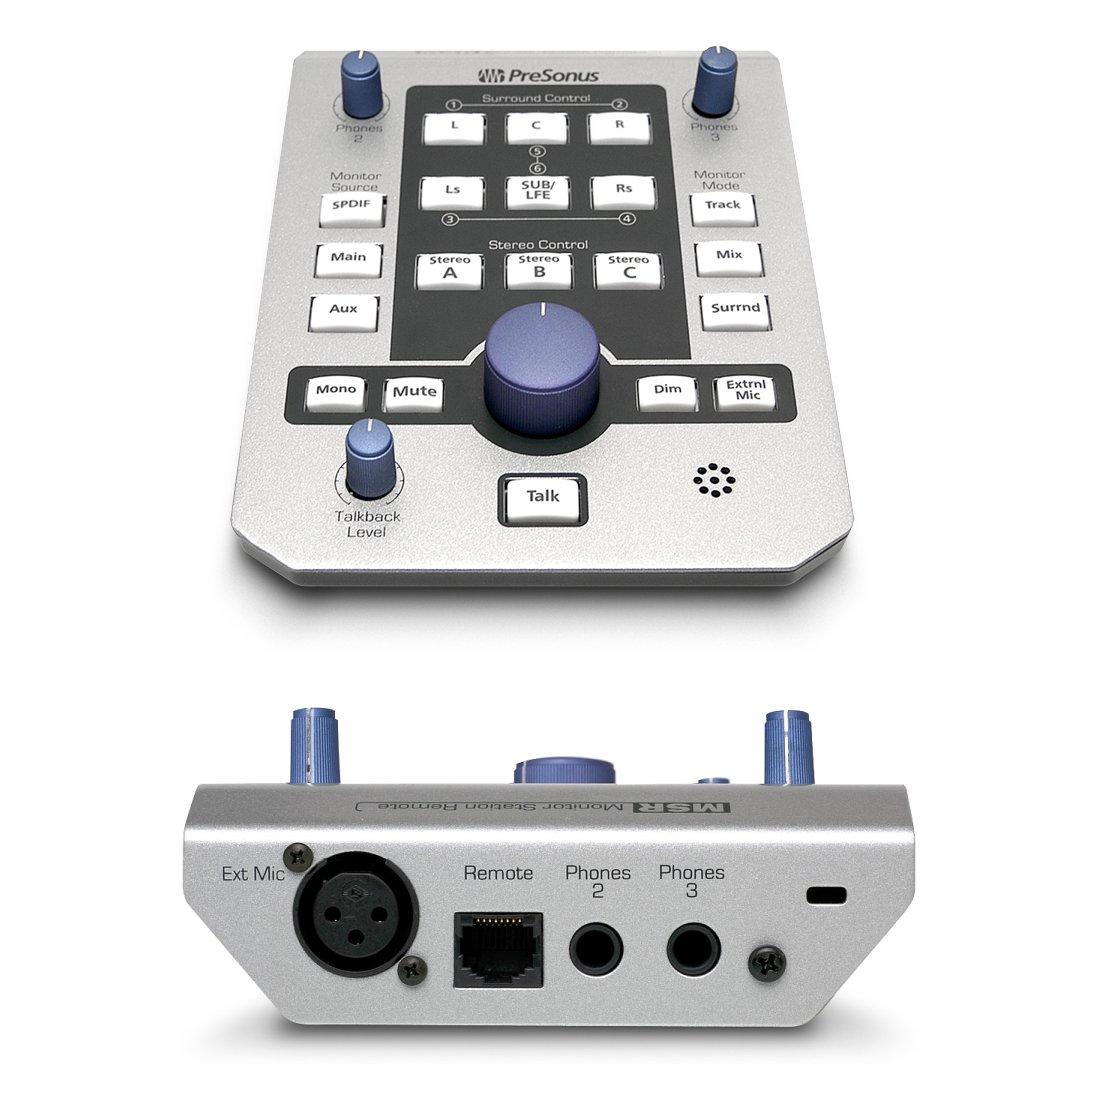 presonus msr monitor station remote image 733794 audiofanzine. Black Bedroom Furniture Sets. Home Design Ideas